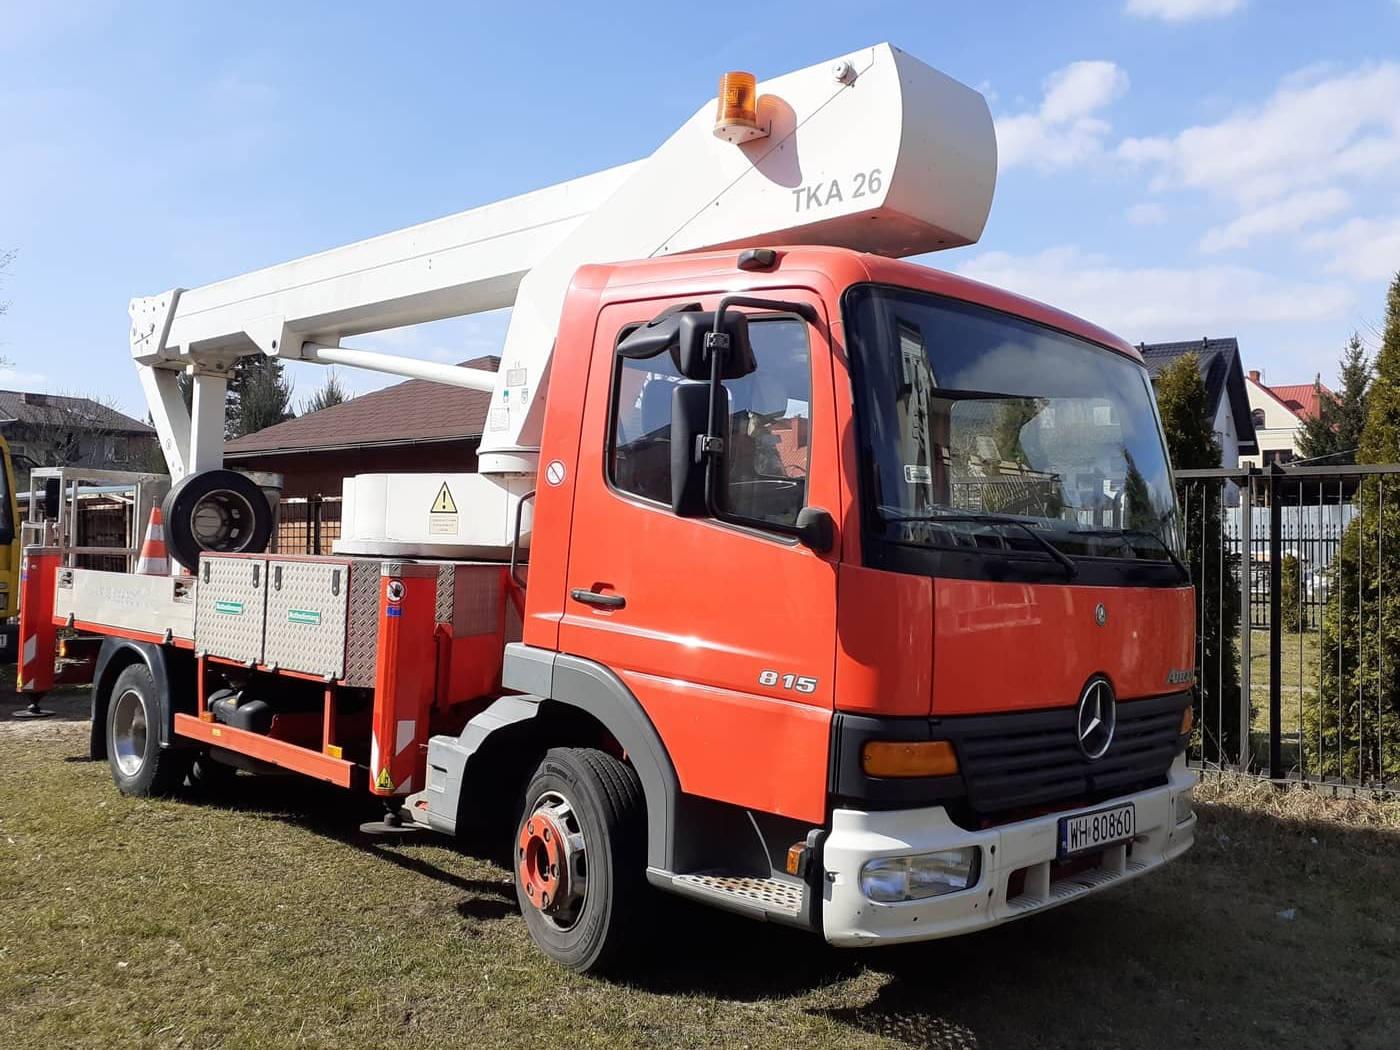 liftstar-podnosnik-tka26-2 (5)2